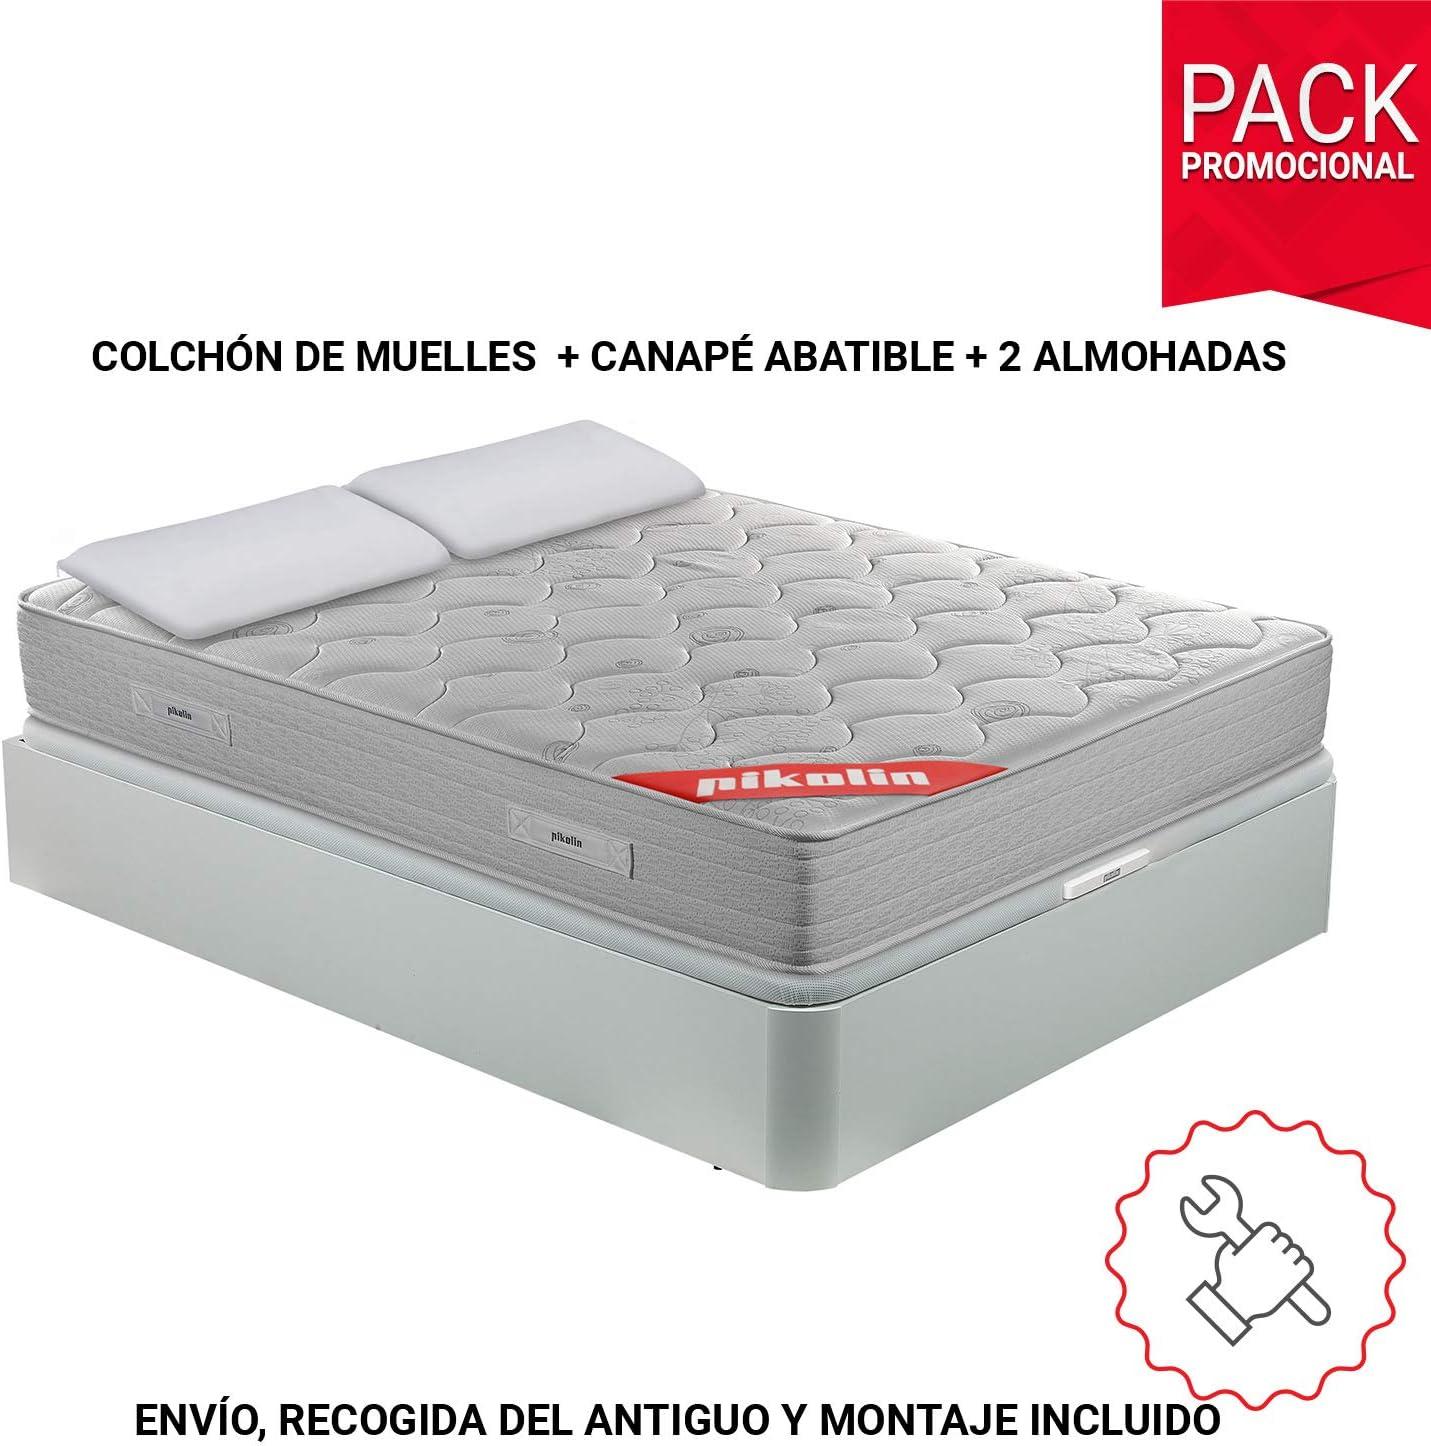 PIKOLIN Pack Colchón viscoelástico de muelles 135x190+ canapé con Base abatible Blanco y Dos Almohadas de Fibra: Amazon.es: Hogar